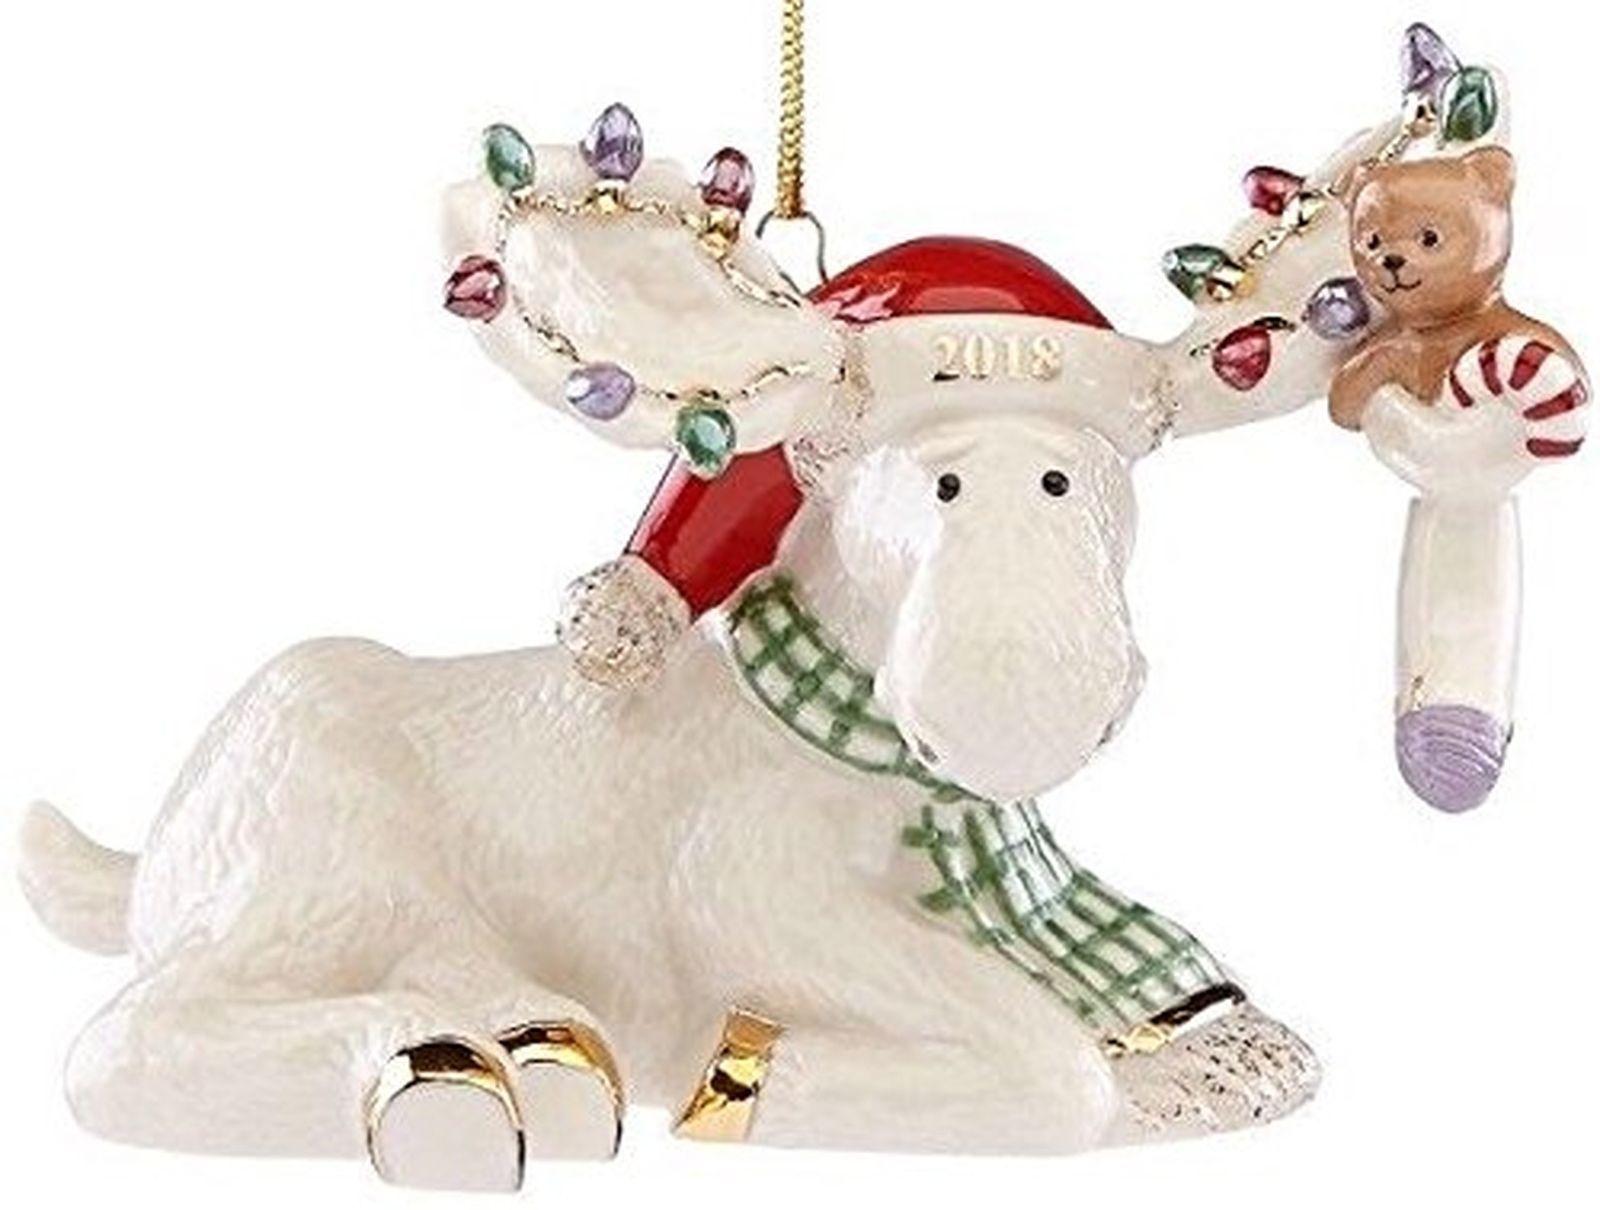 Lenox Christmas.Lenox Christmas Ornament 2010s 40 Listings